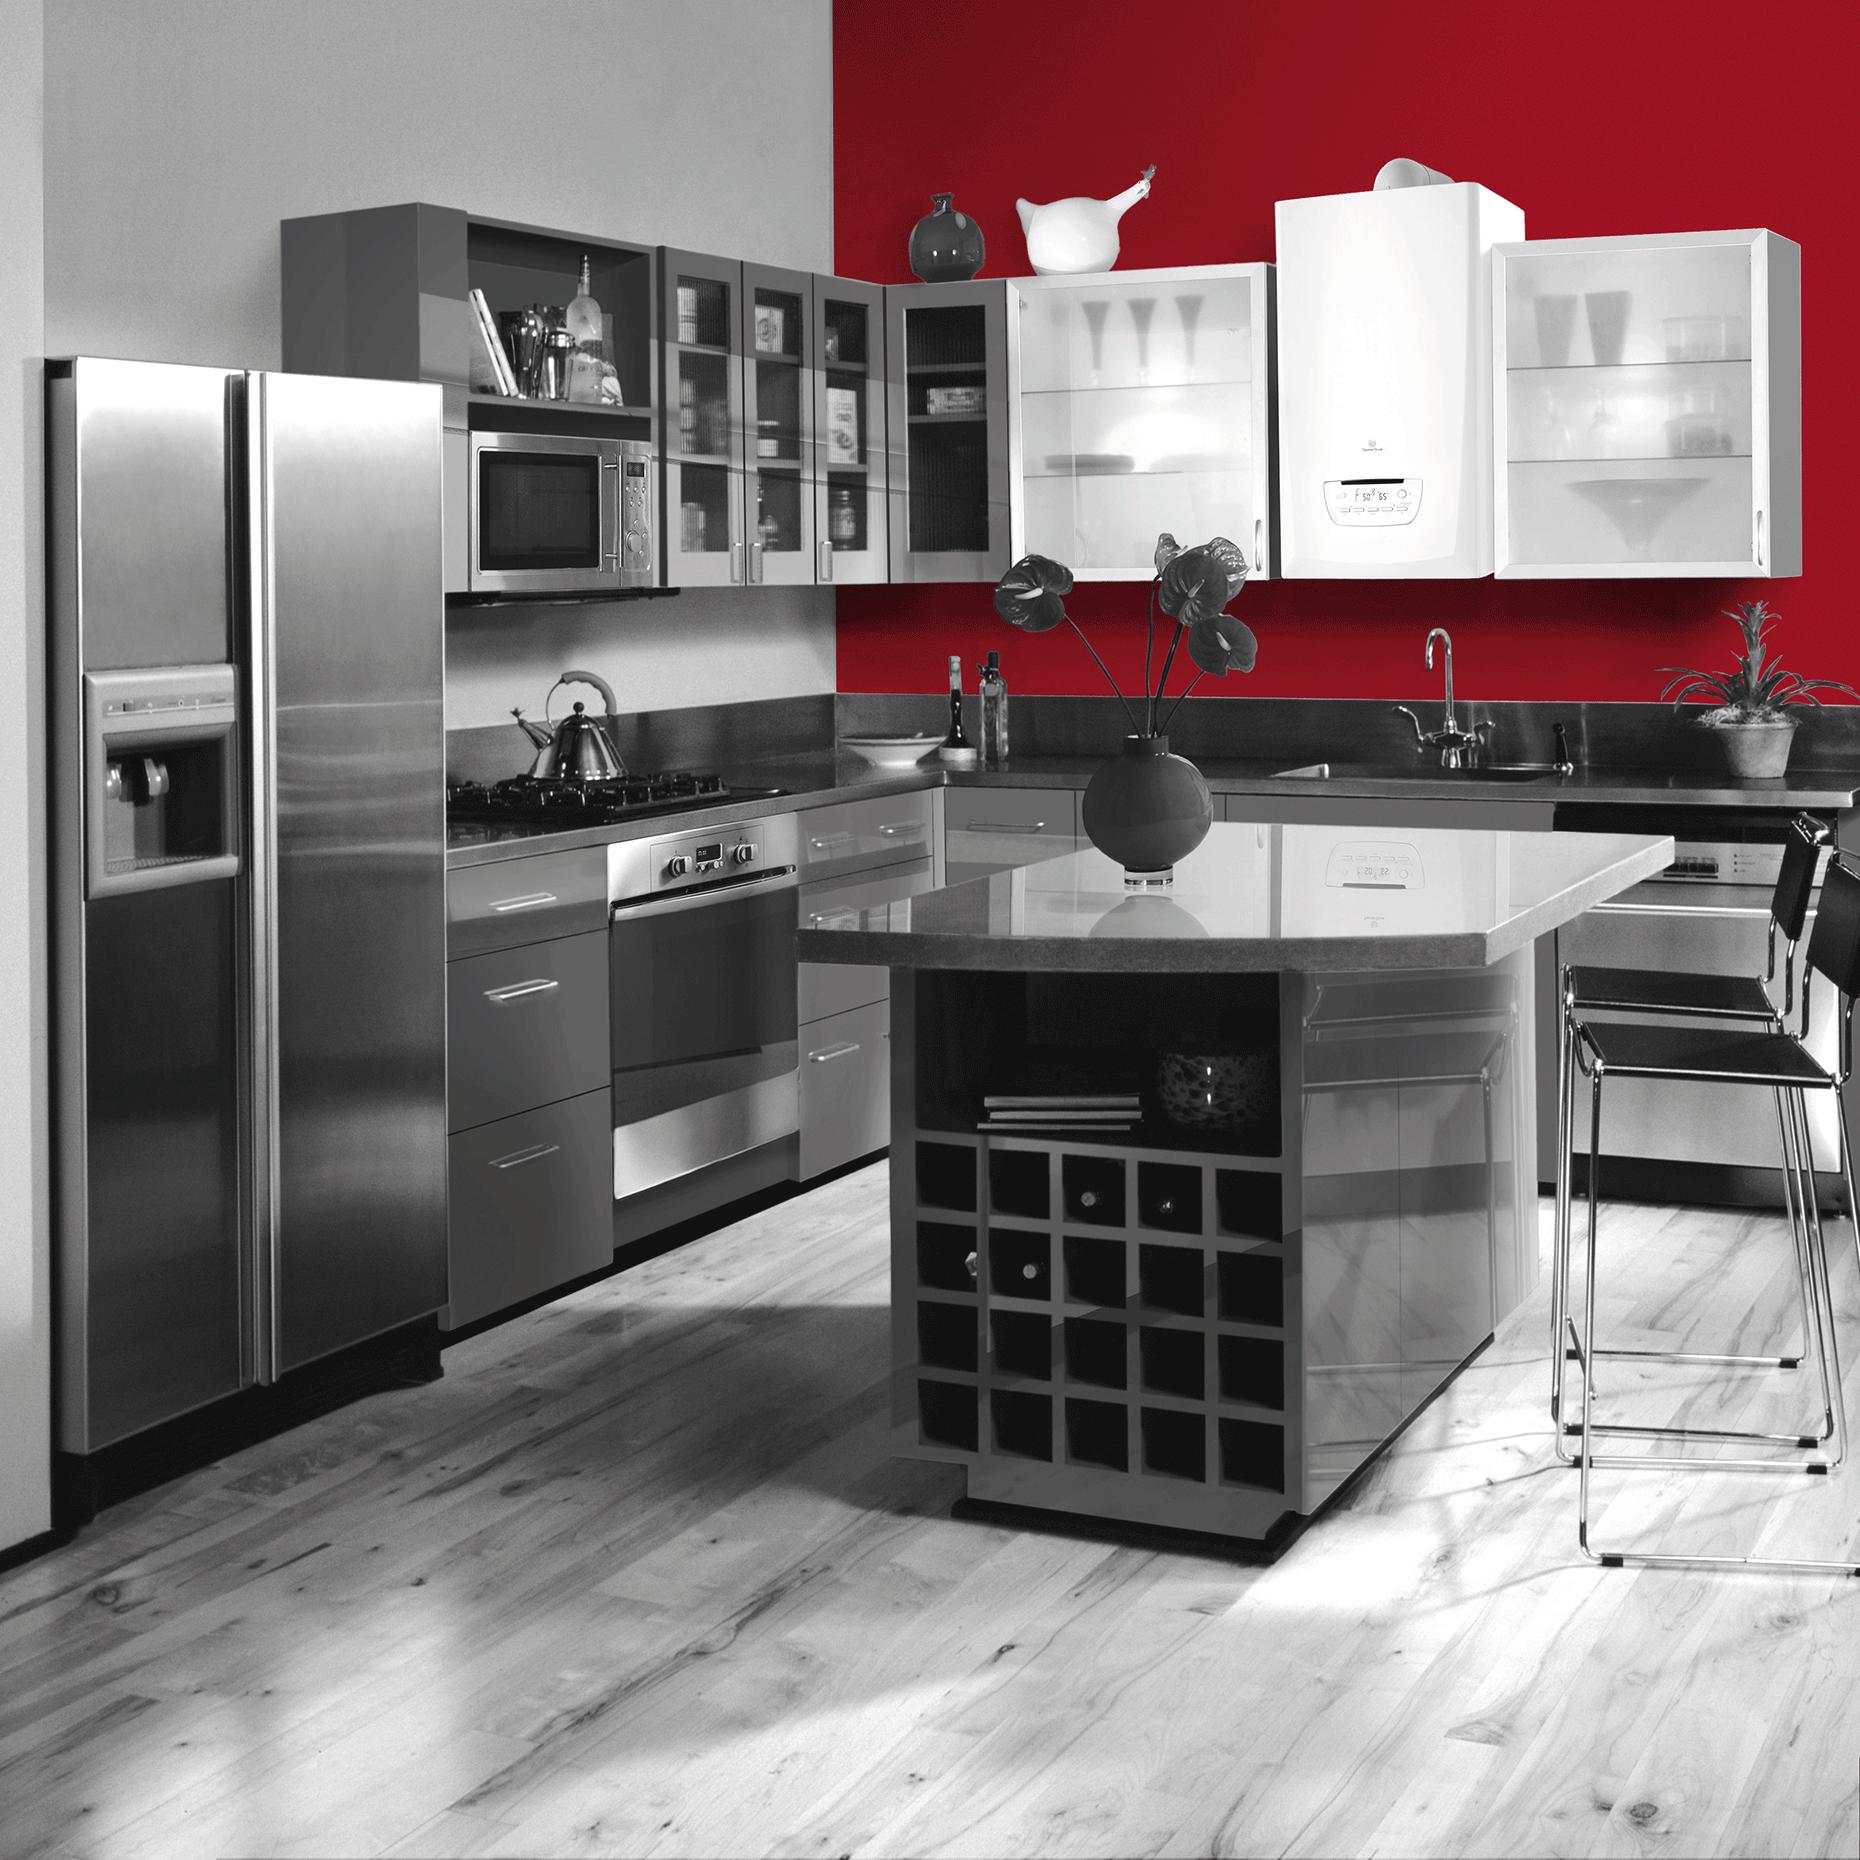 chaudi re murale gaz condensation themaplus condens saunier duval. Black Bedroom Furniture Sets. Home Design Ideas